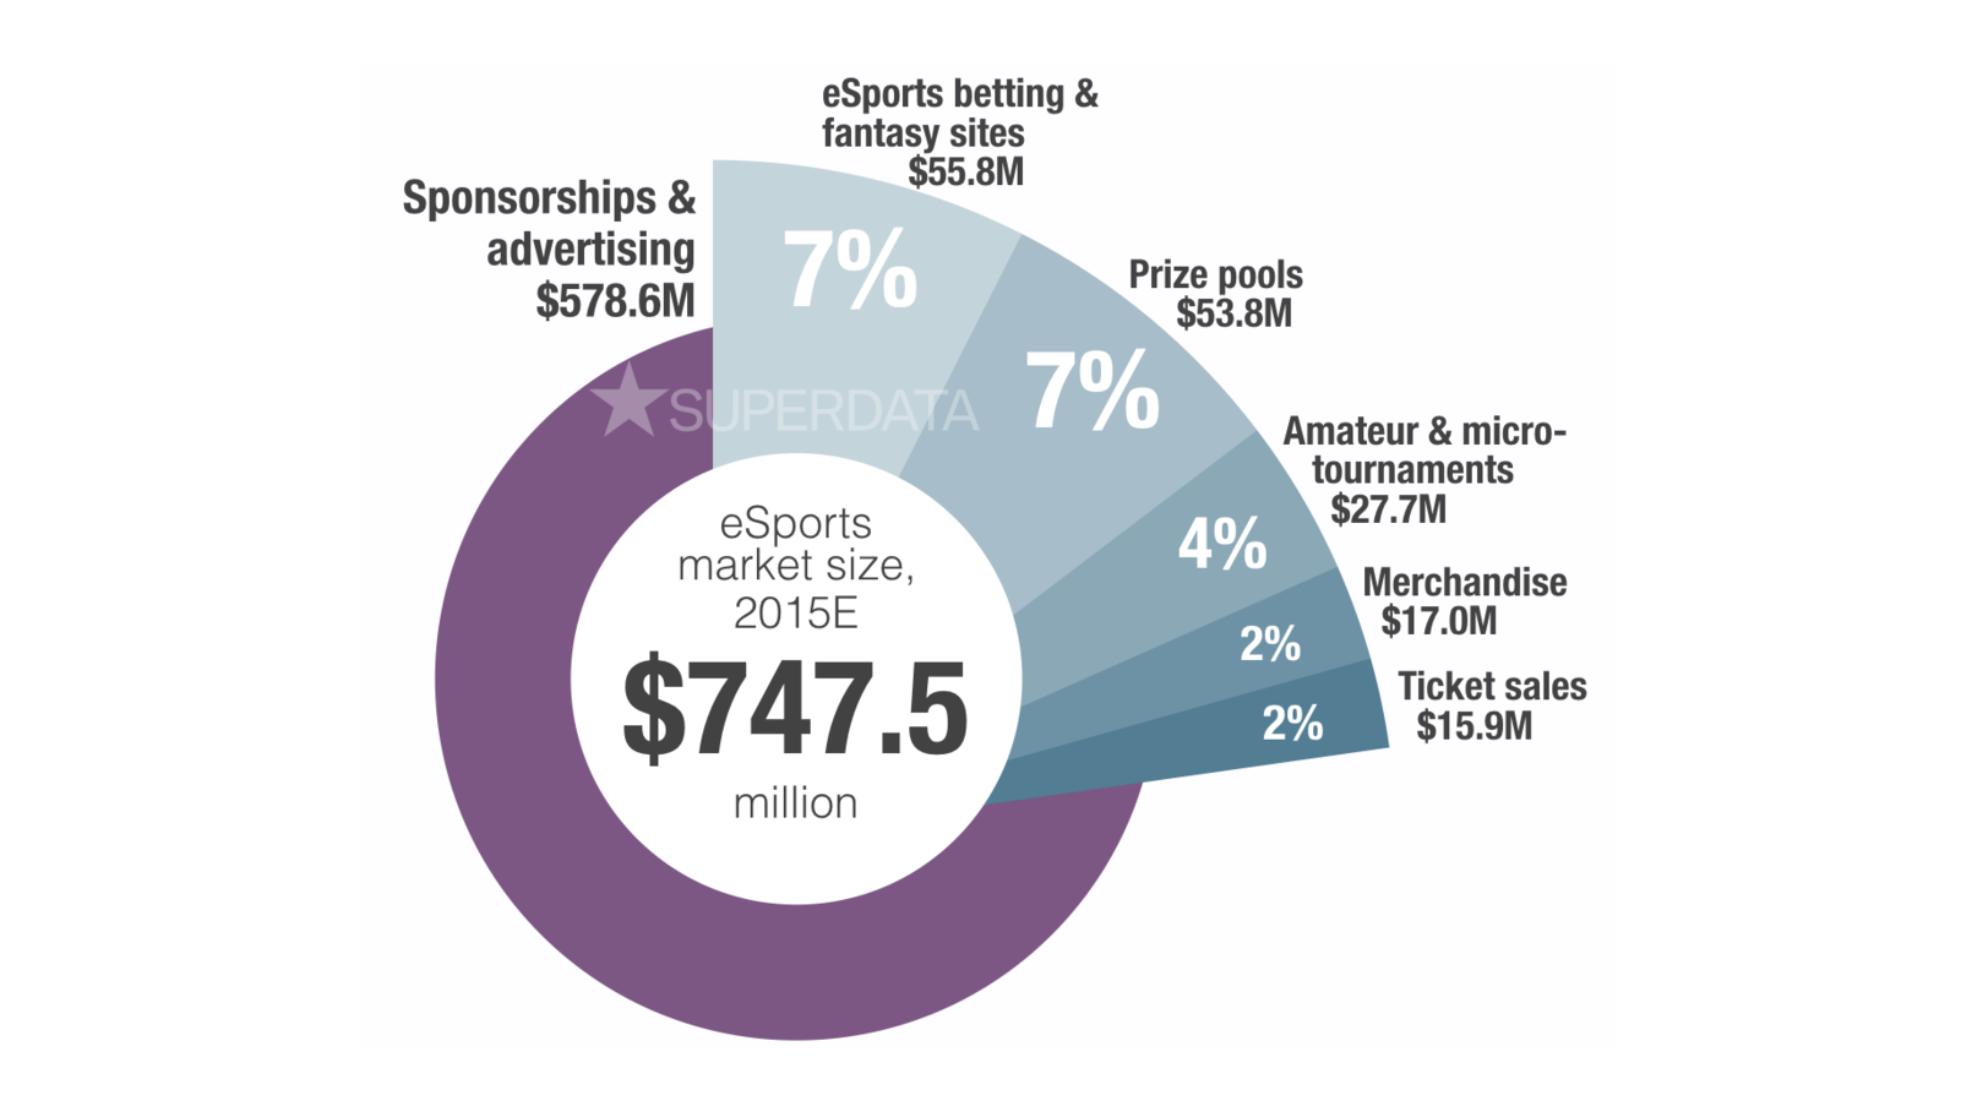 eSports industry